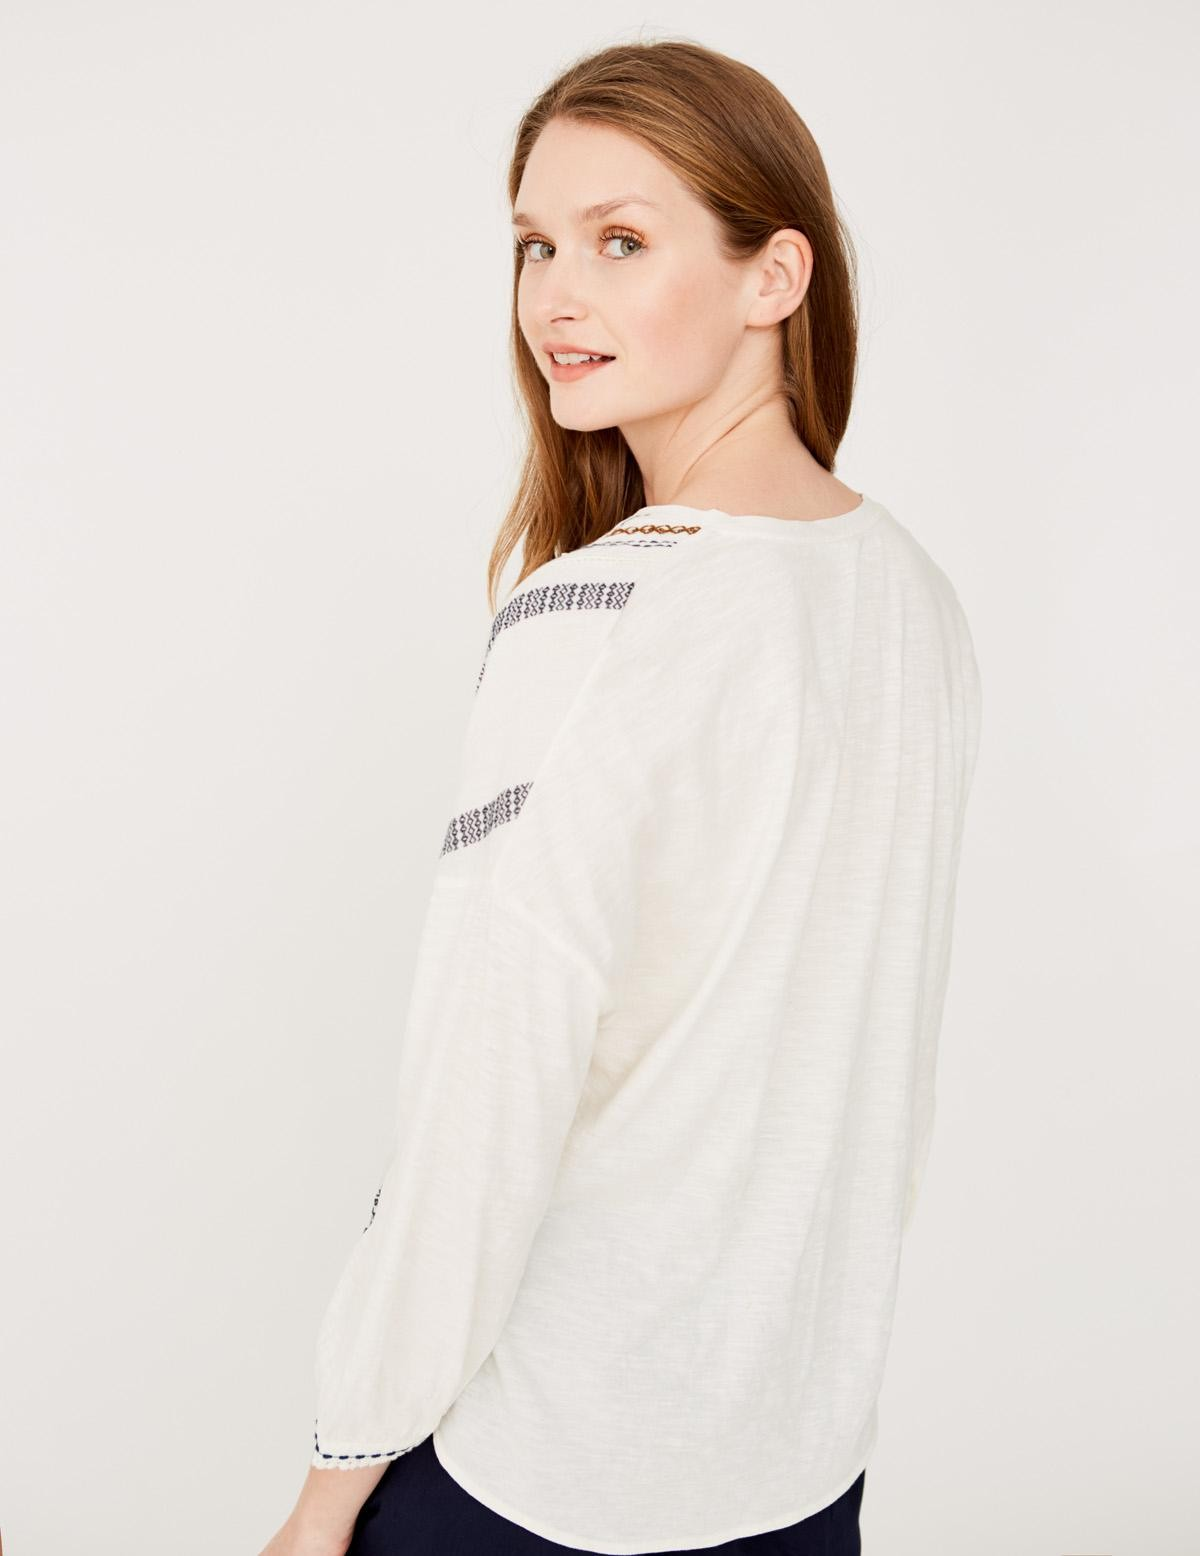 Camisa jacquard y bordado - Ítem1